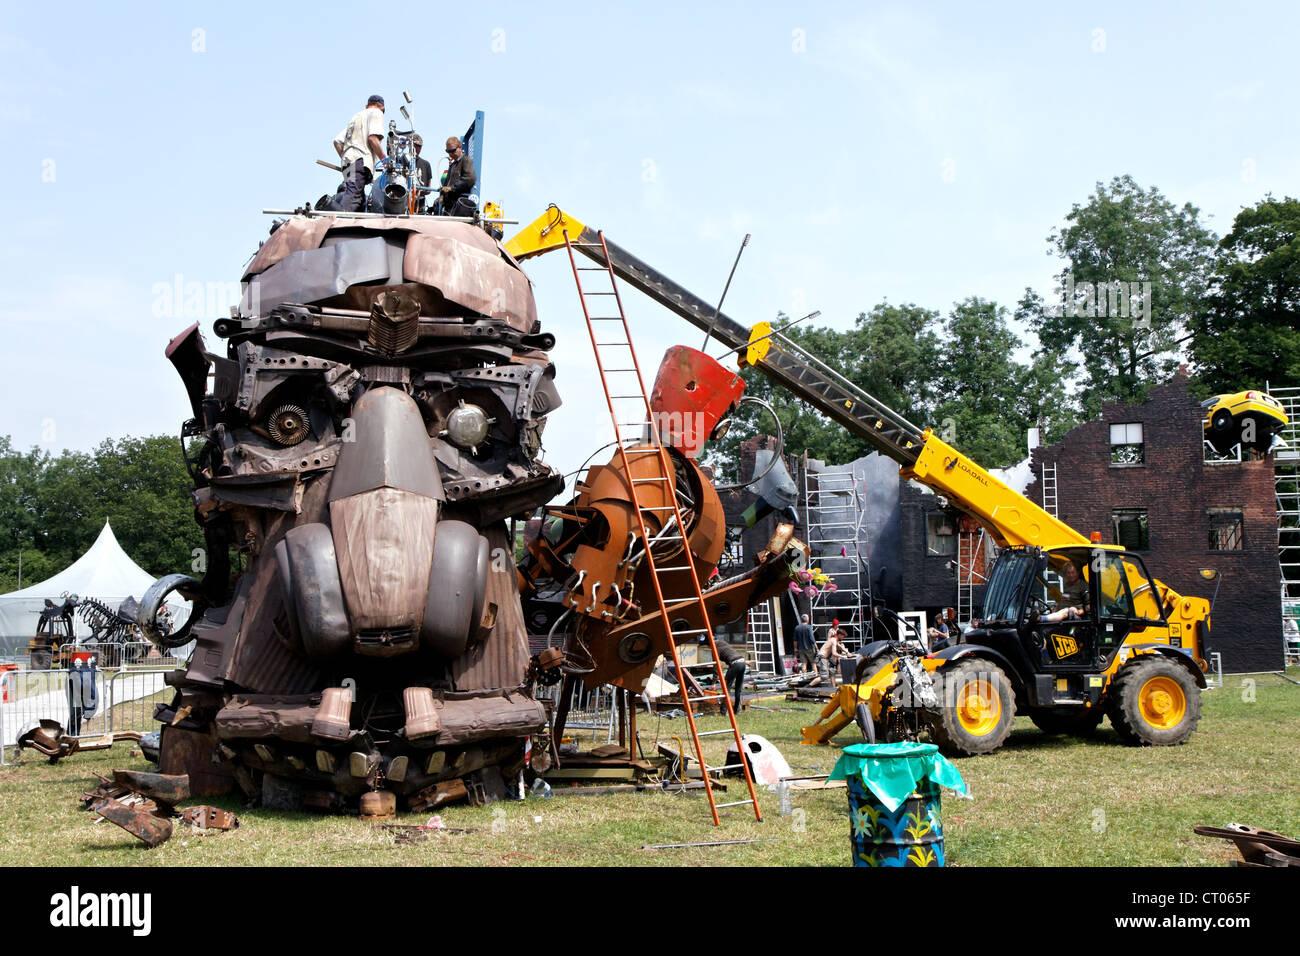 Artists build large sculpture metal head out of scrap car parts at ...